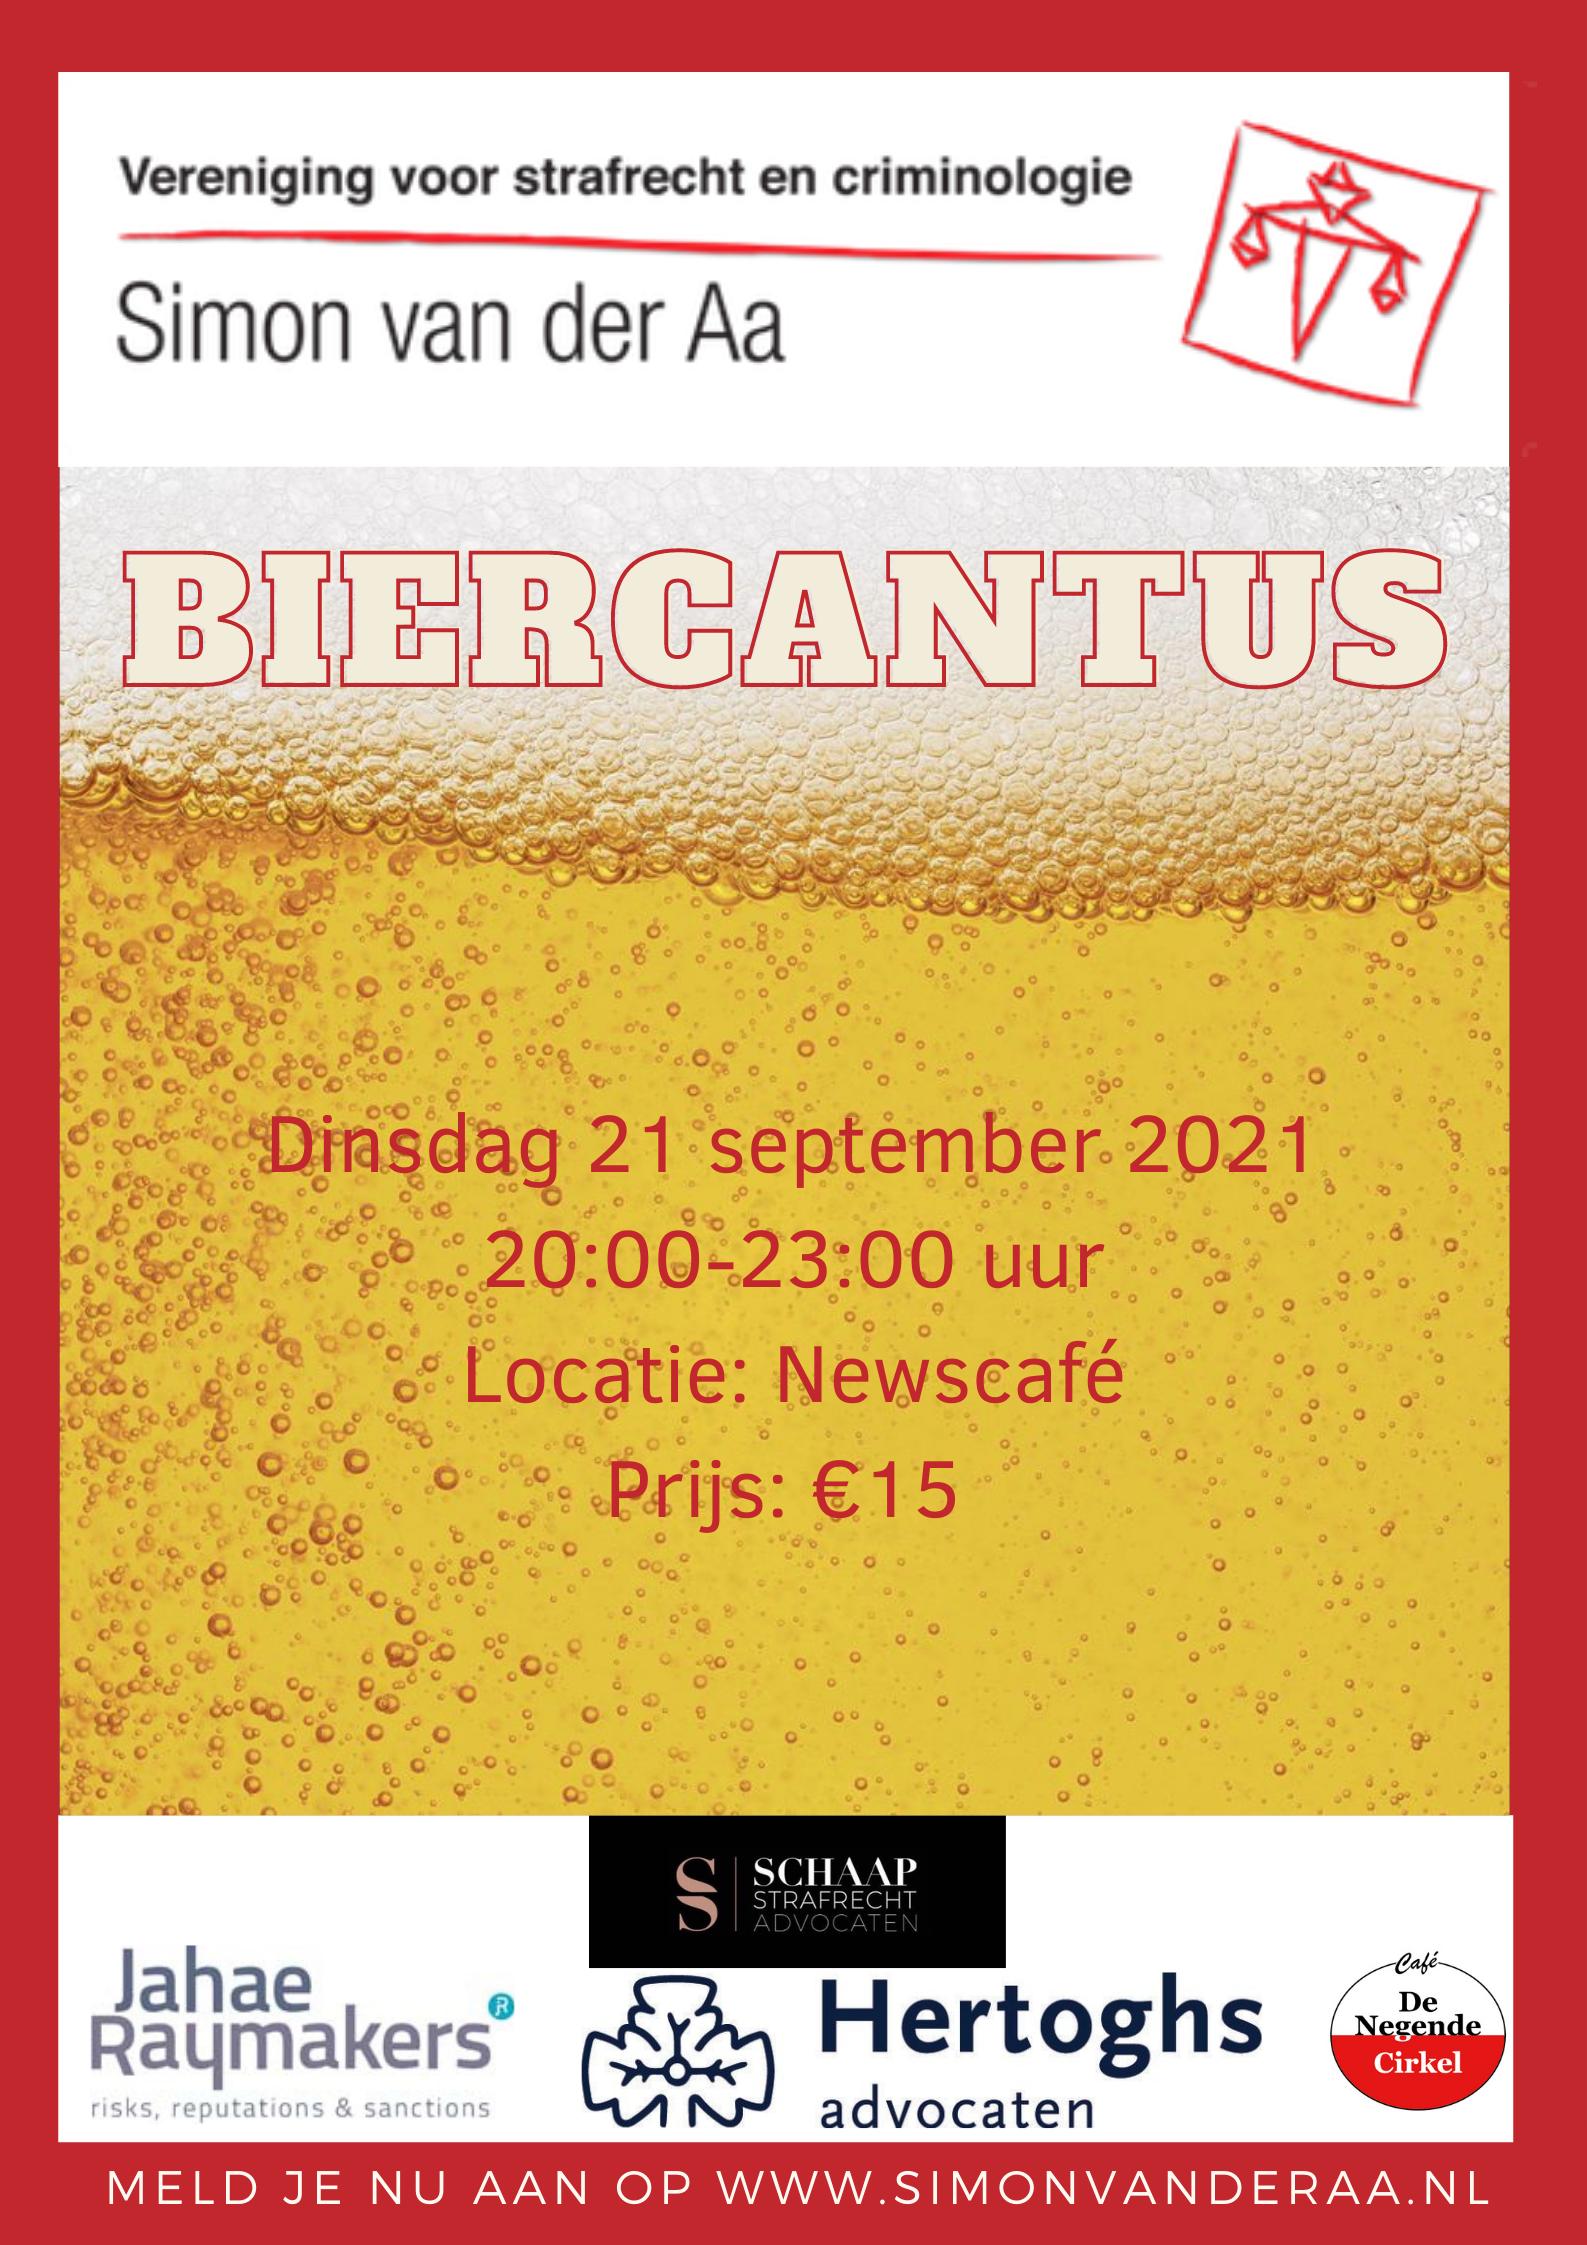 Biercantus